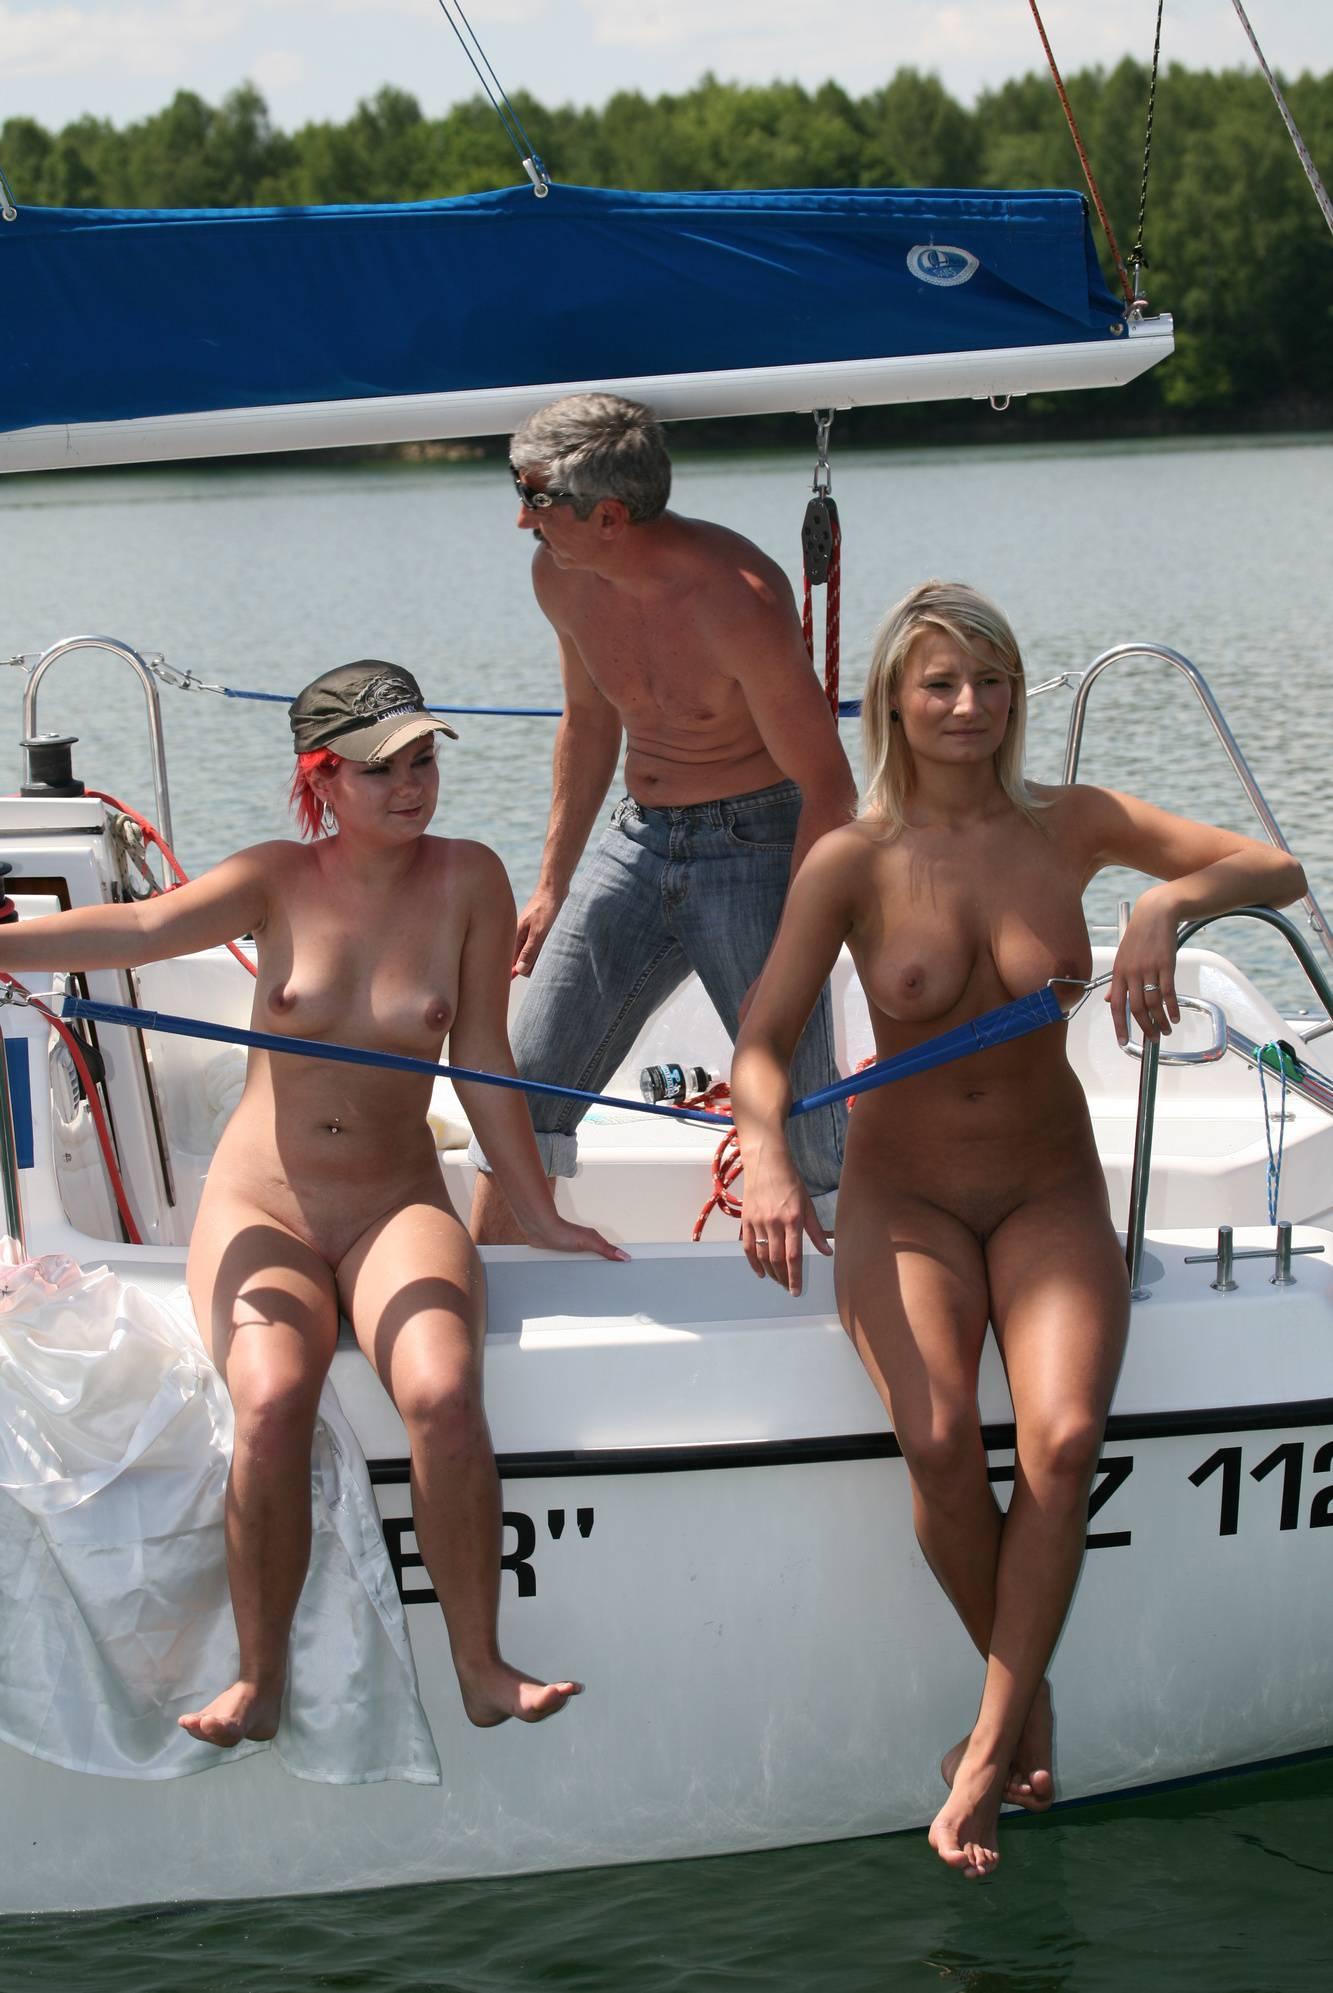 Nudist Pics Seaworthy Piwot Yacht - 2